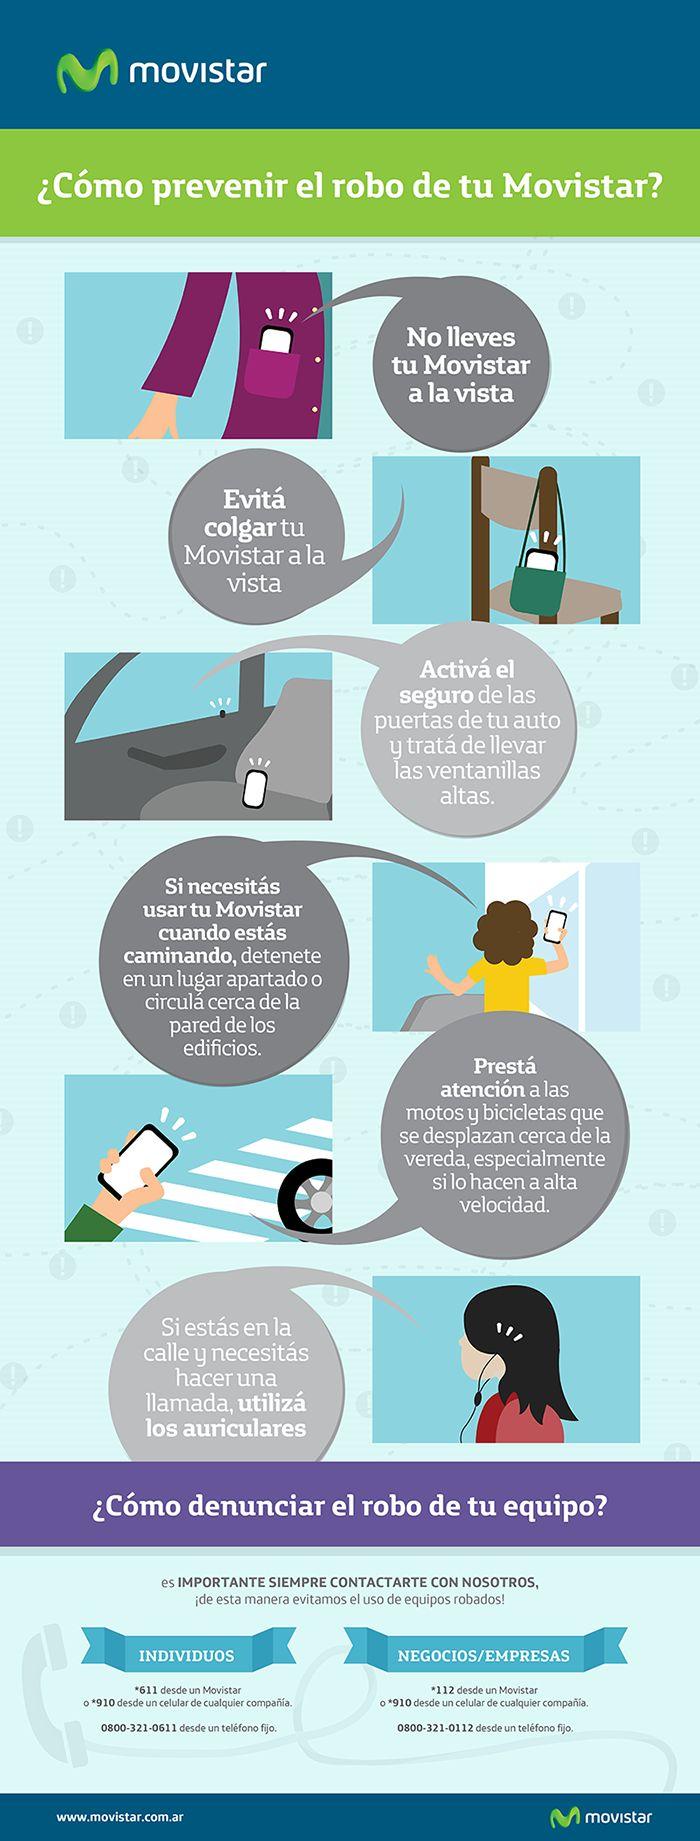 ¿Cómo prevenir el robo de tu celular? #Celulares #Movistar #Cuidados ¿Más info? Ingresá en http://www.movistar.com.ar/robo-de-equipos/?utm_source=pinterest&utm_medium=socialmedia&utm_content=contenidos&utm_campaign=robocelular